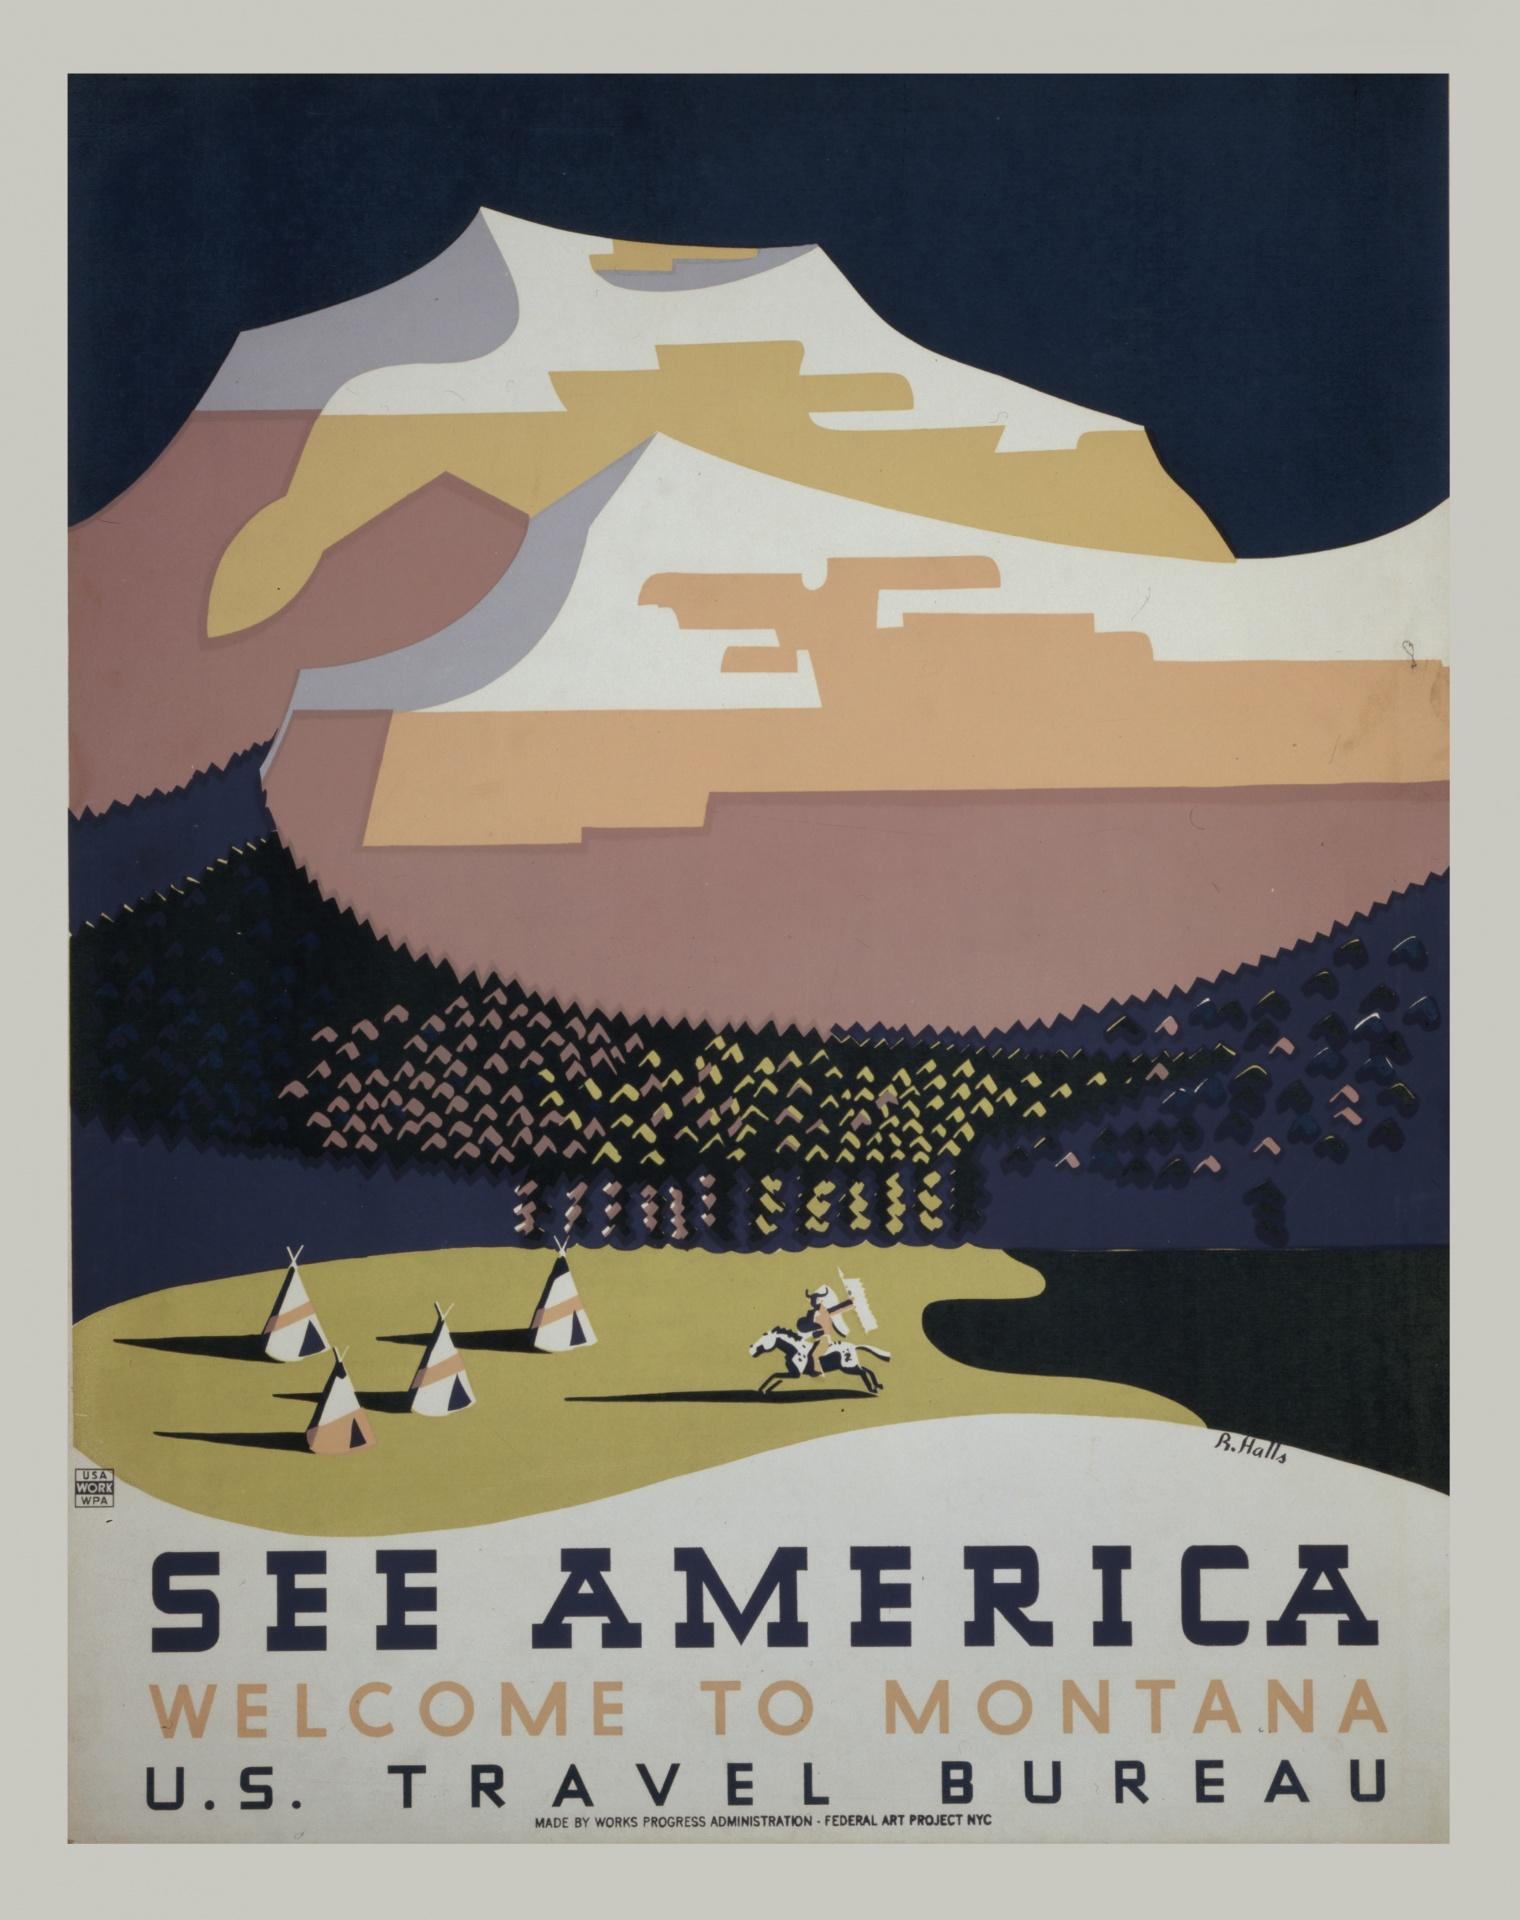 U.S. Travel Bureau ad